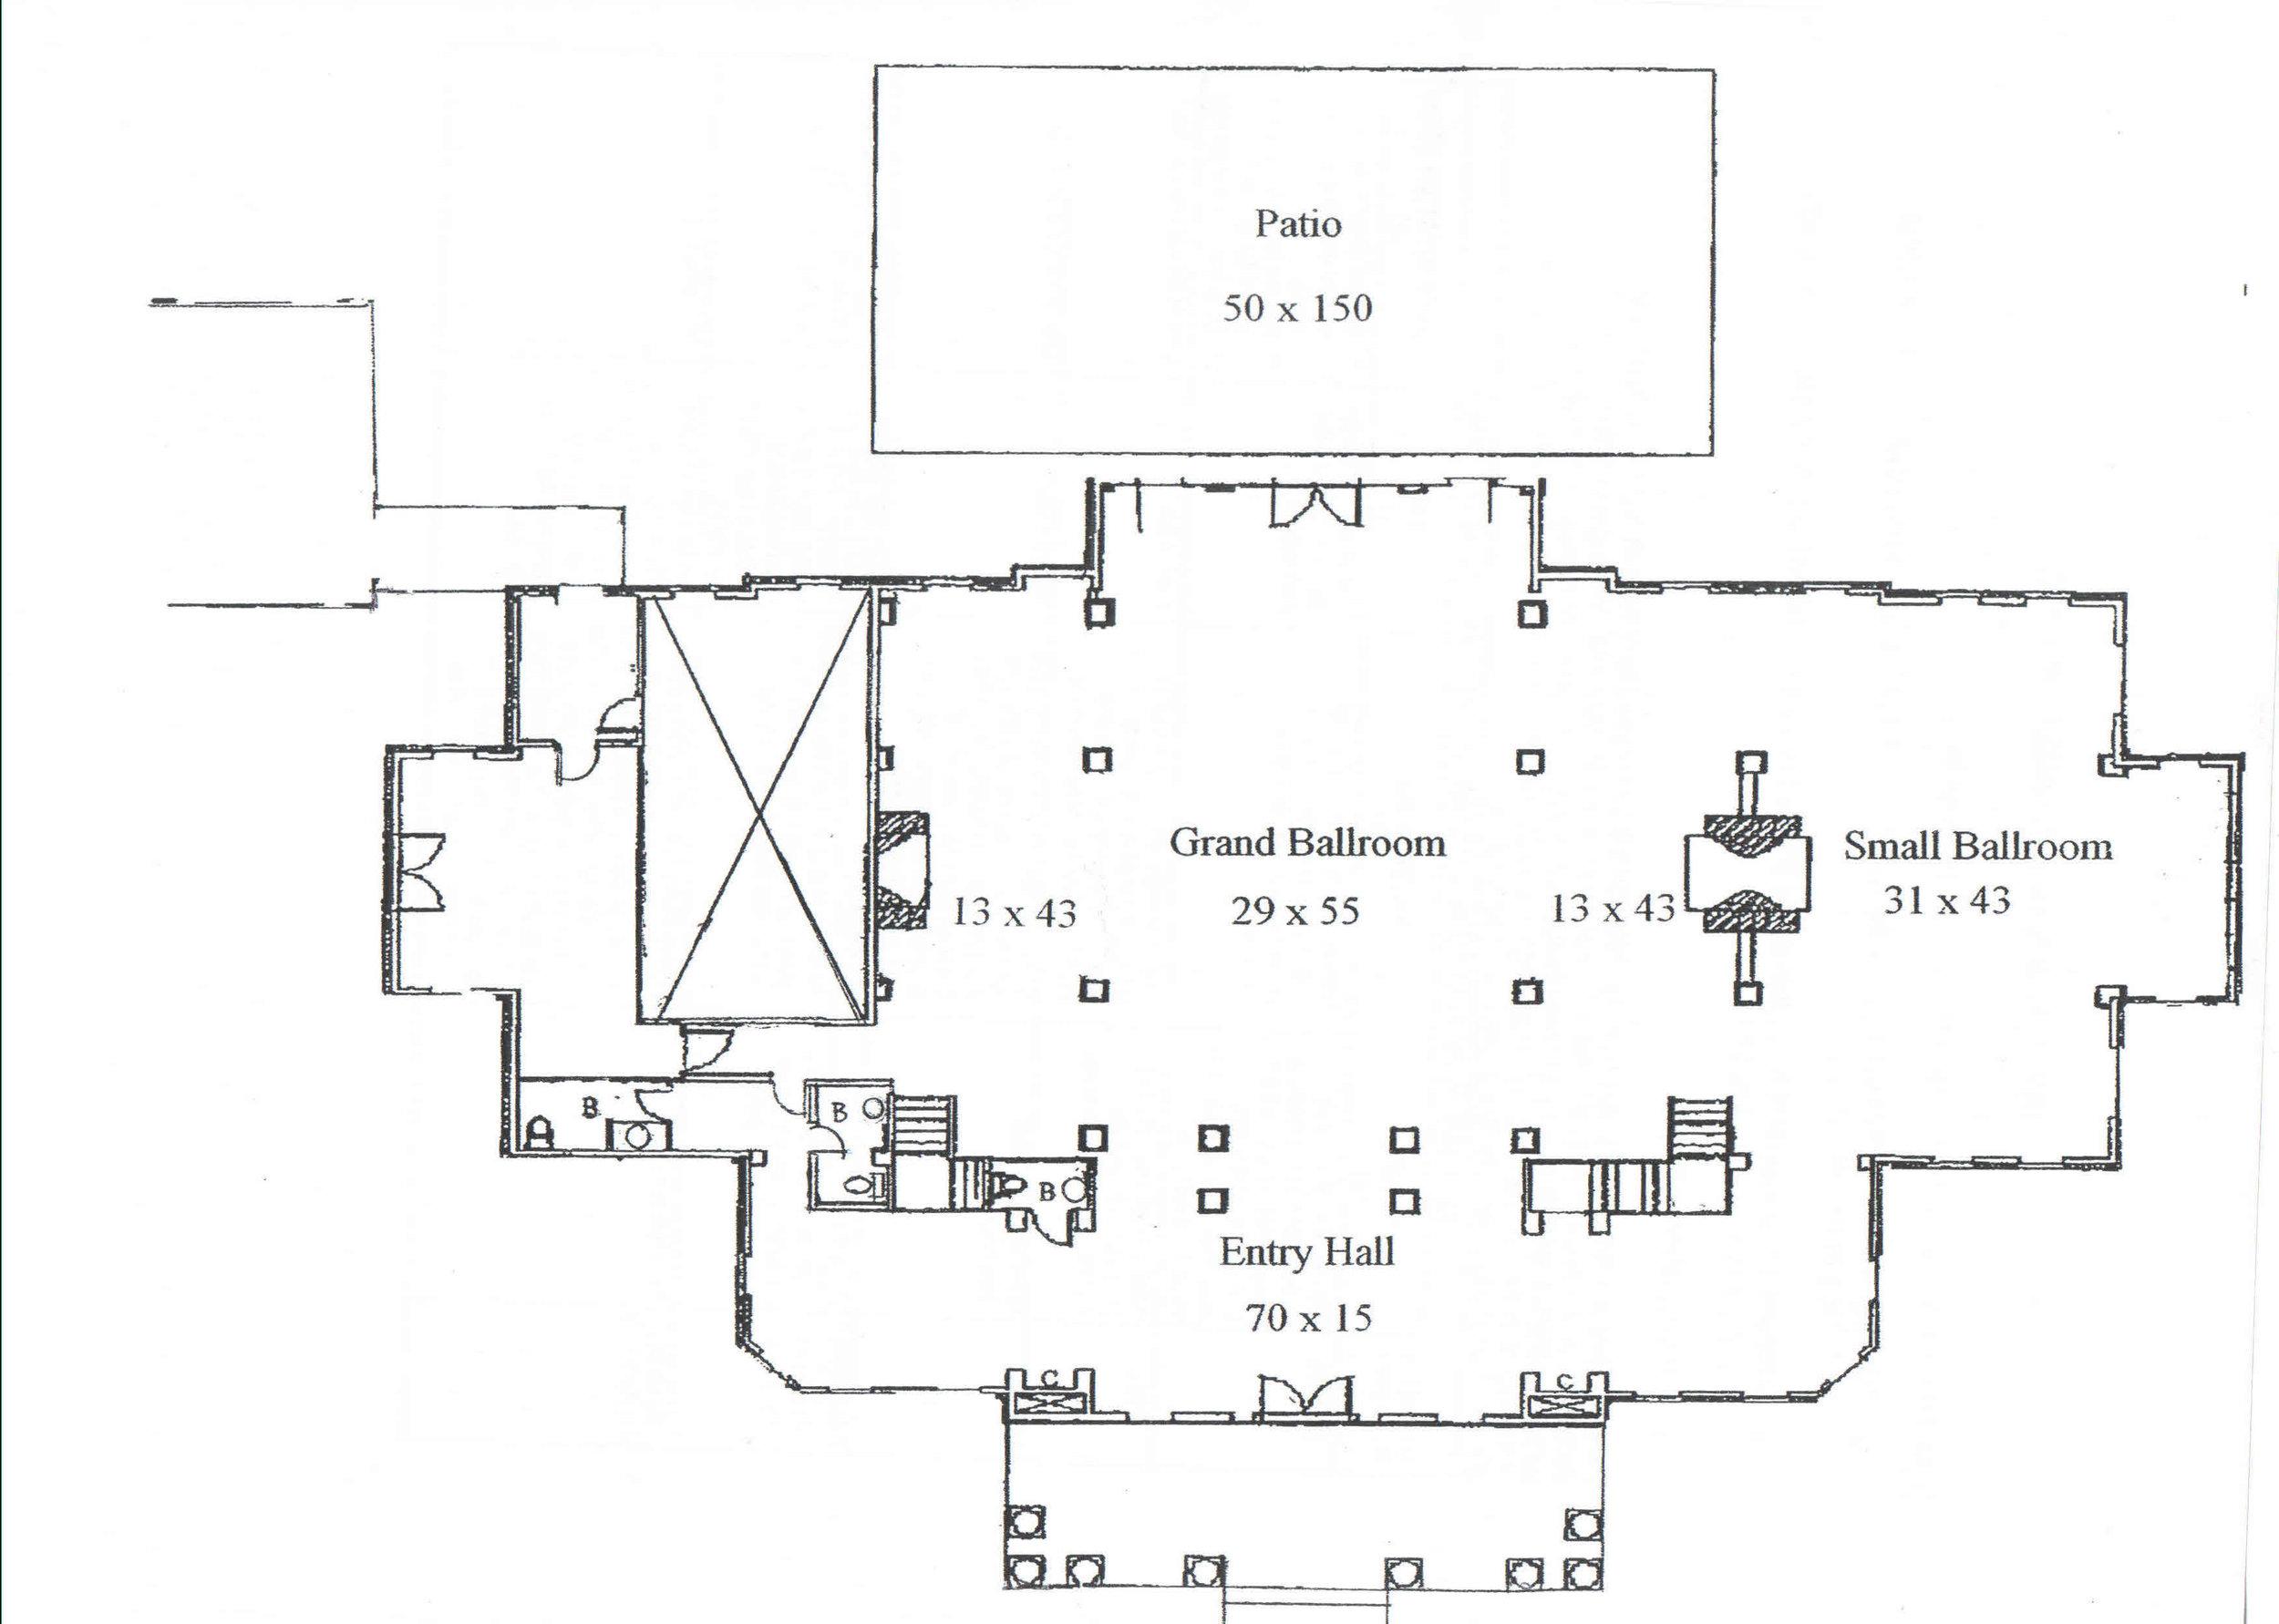 new-rh-floorplan-2015.jpg